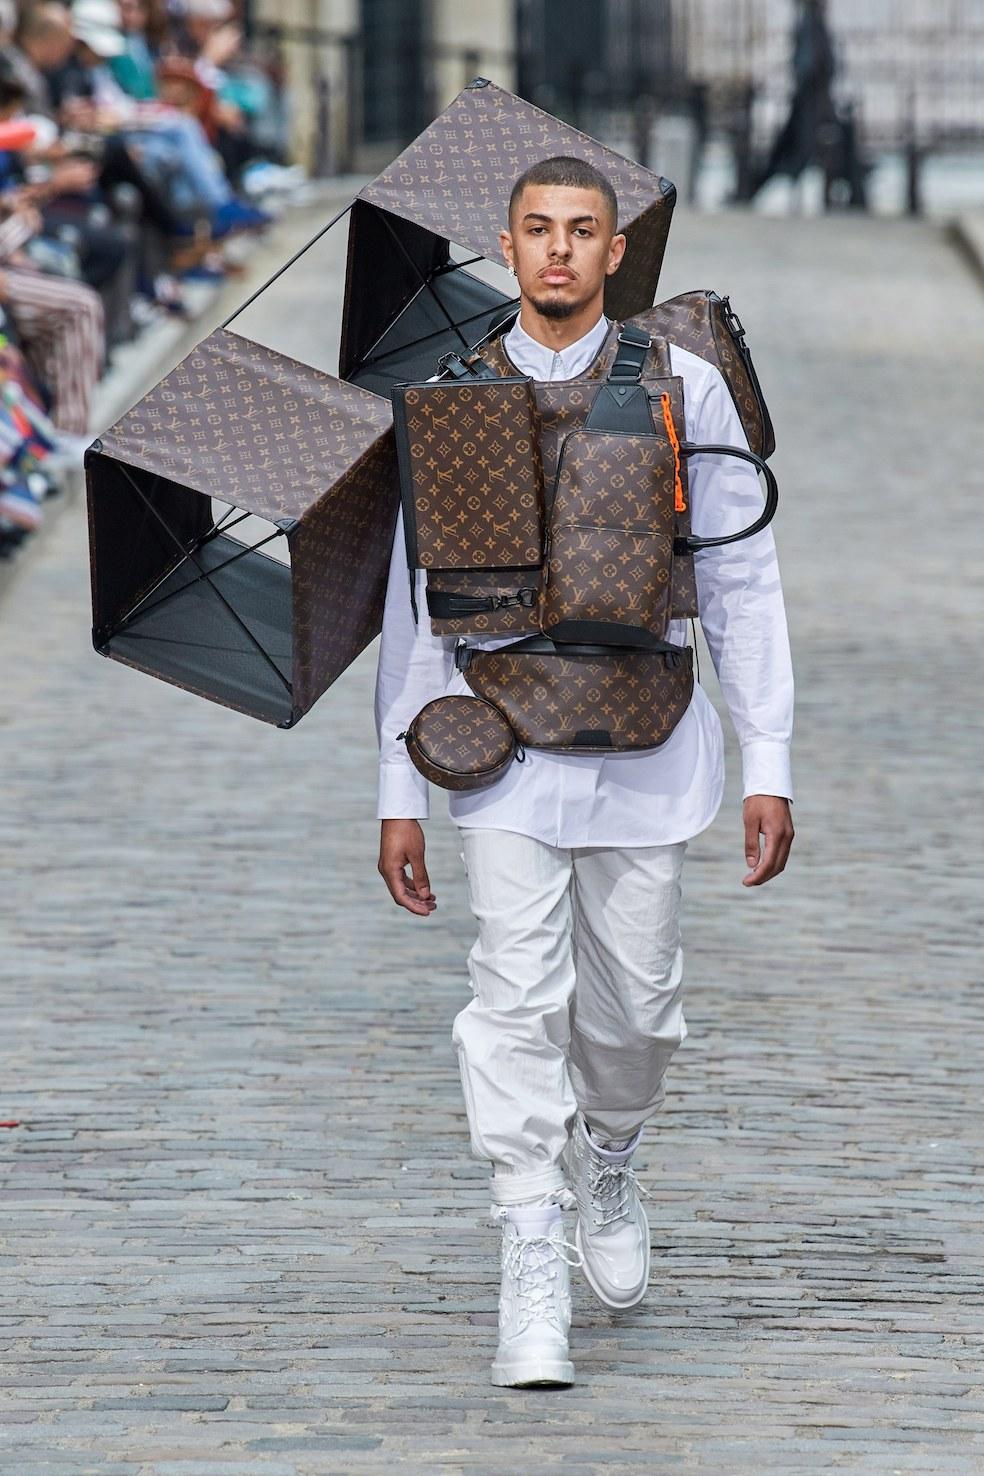 Louis_Vuitton_SS20_Behind_The_Blinds_Magazine__FIO0848.jpg